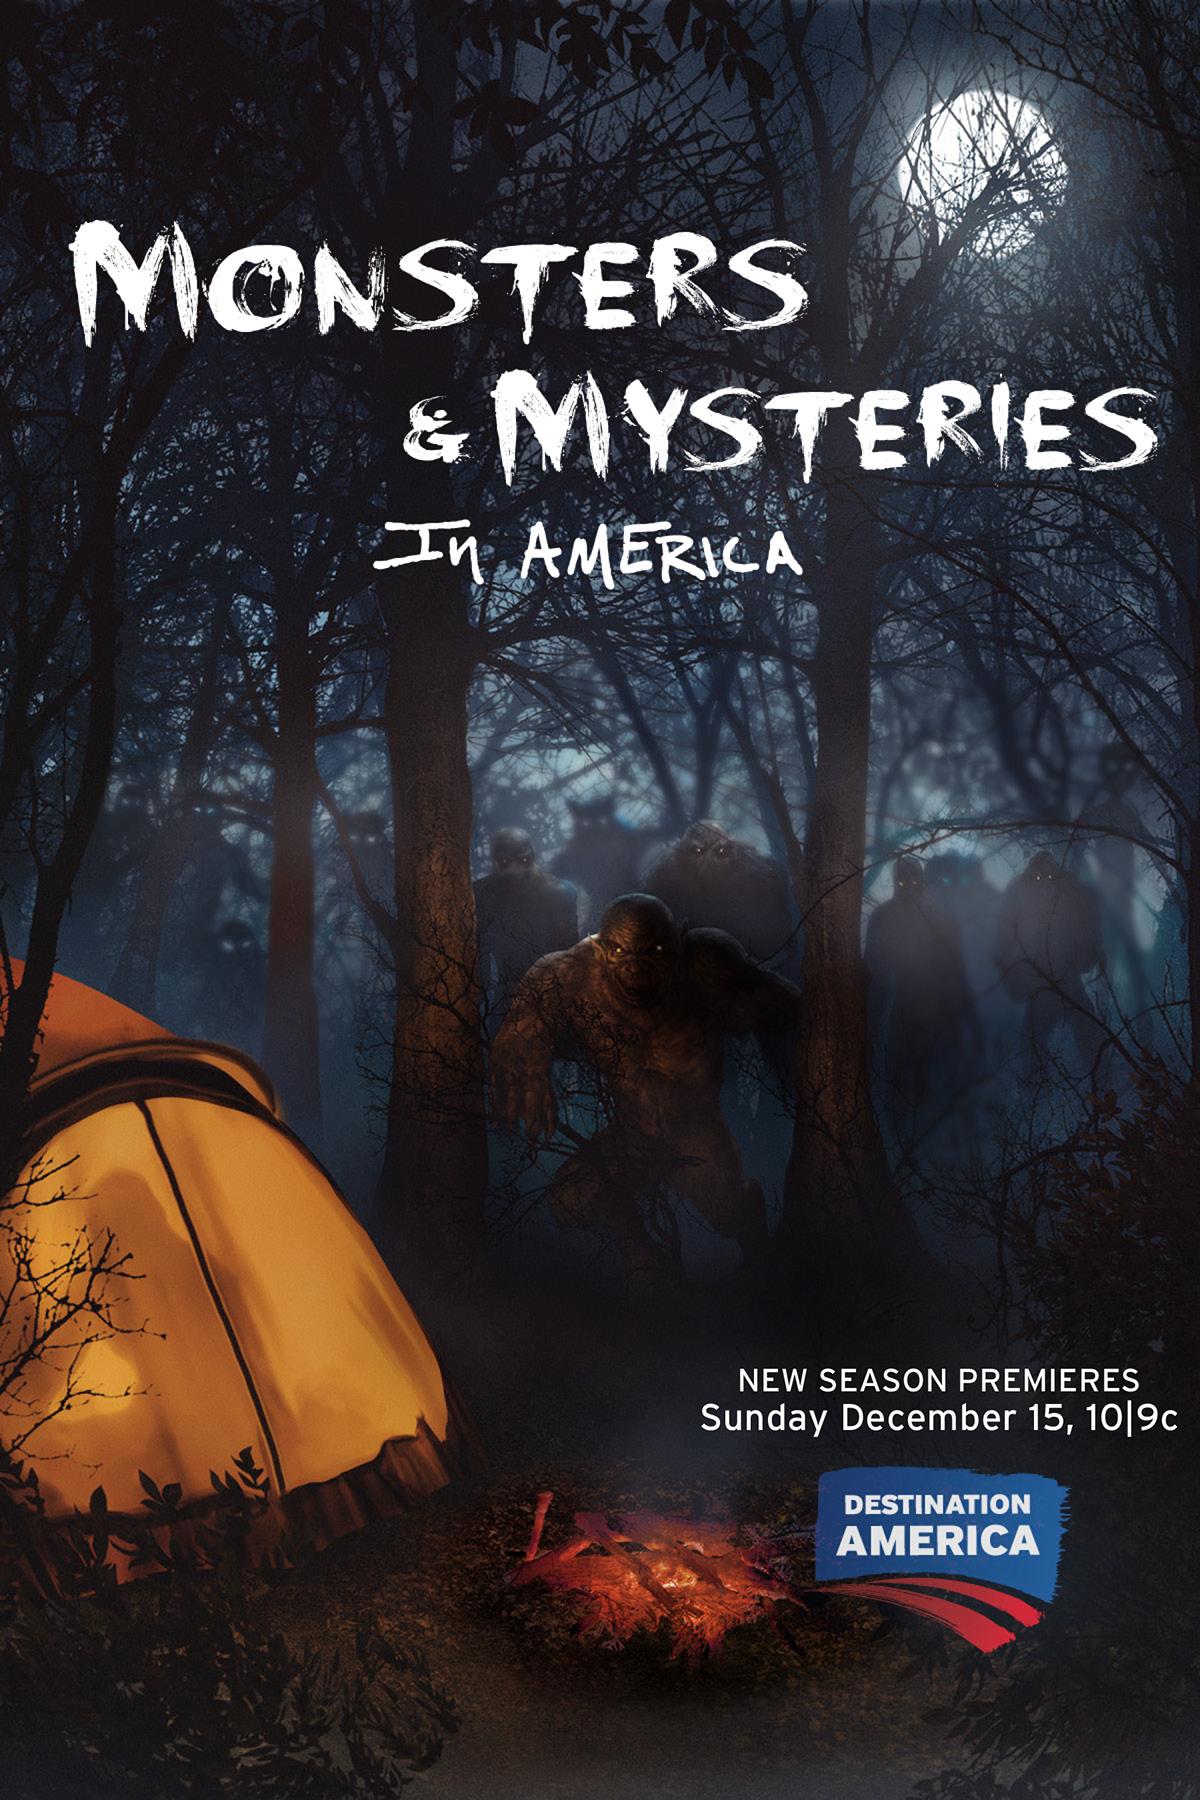 Monsters & Mysteries